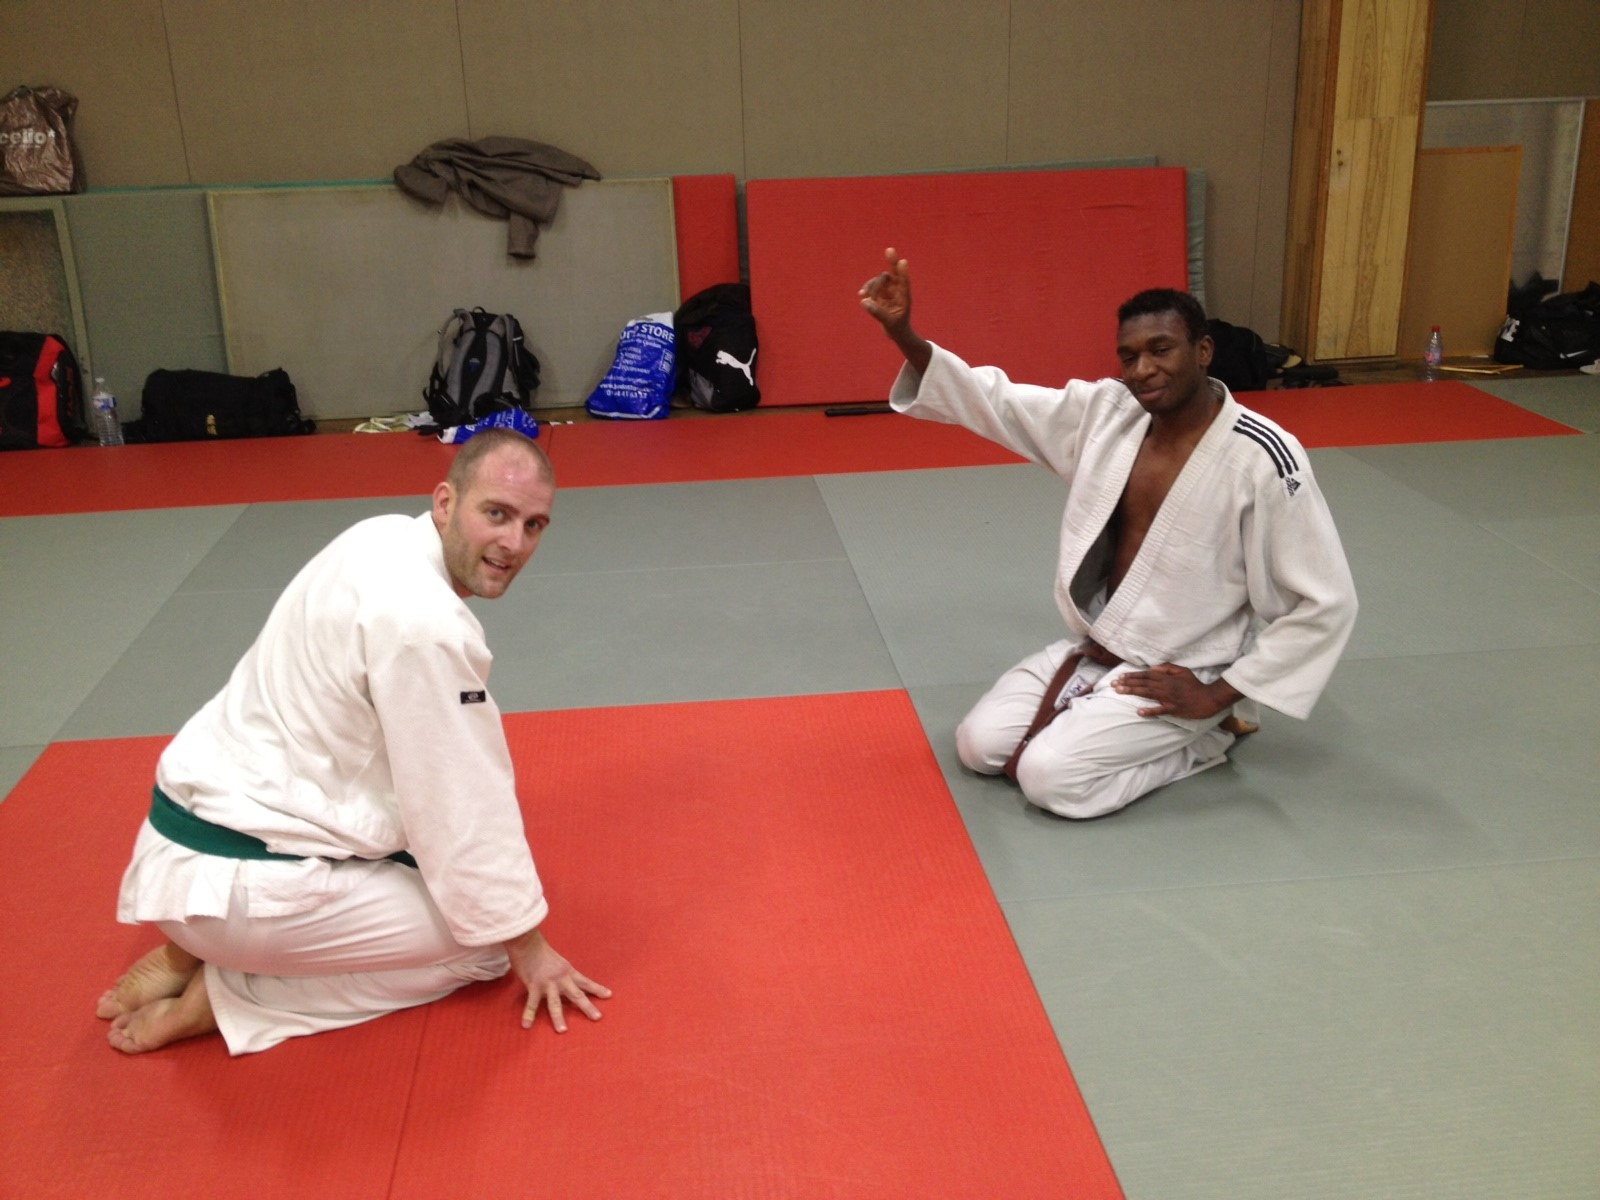 jujitsu-efjjsd-novembre-2013 9